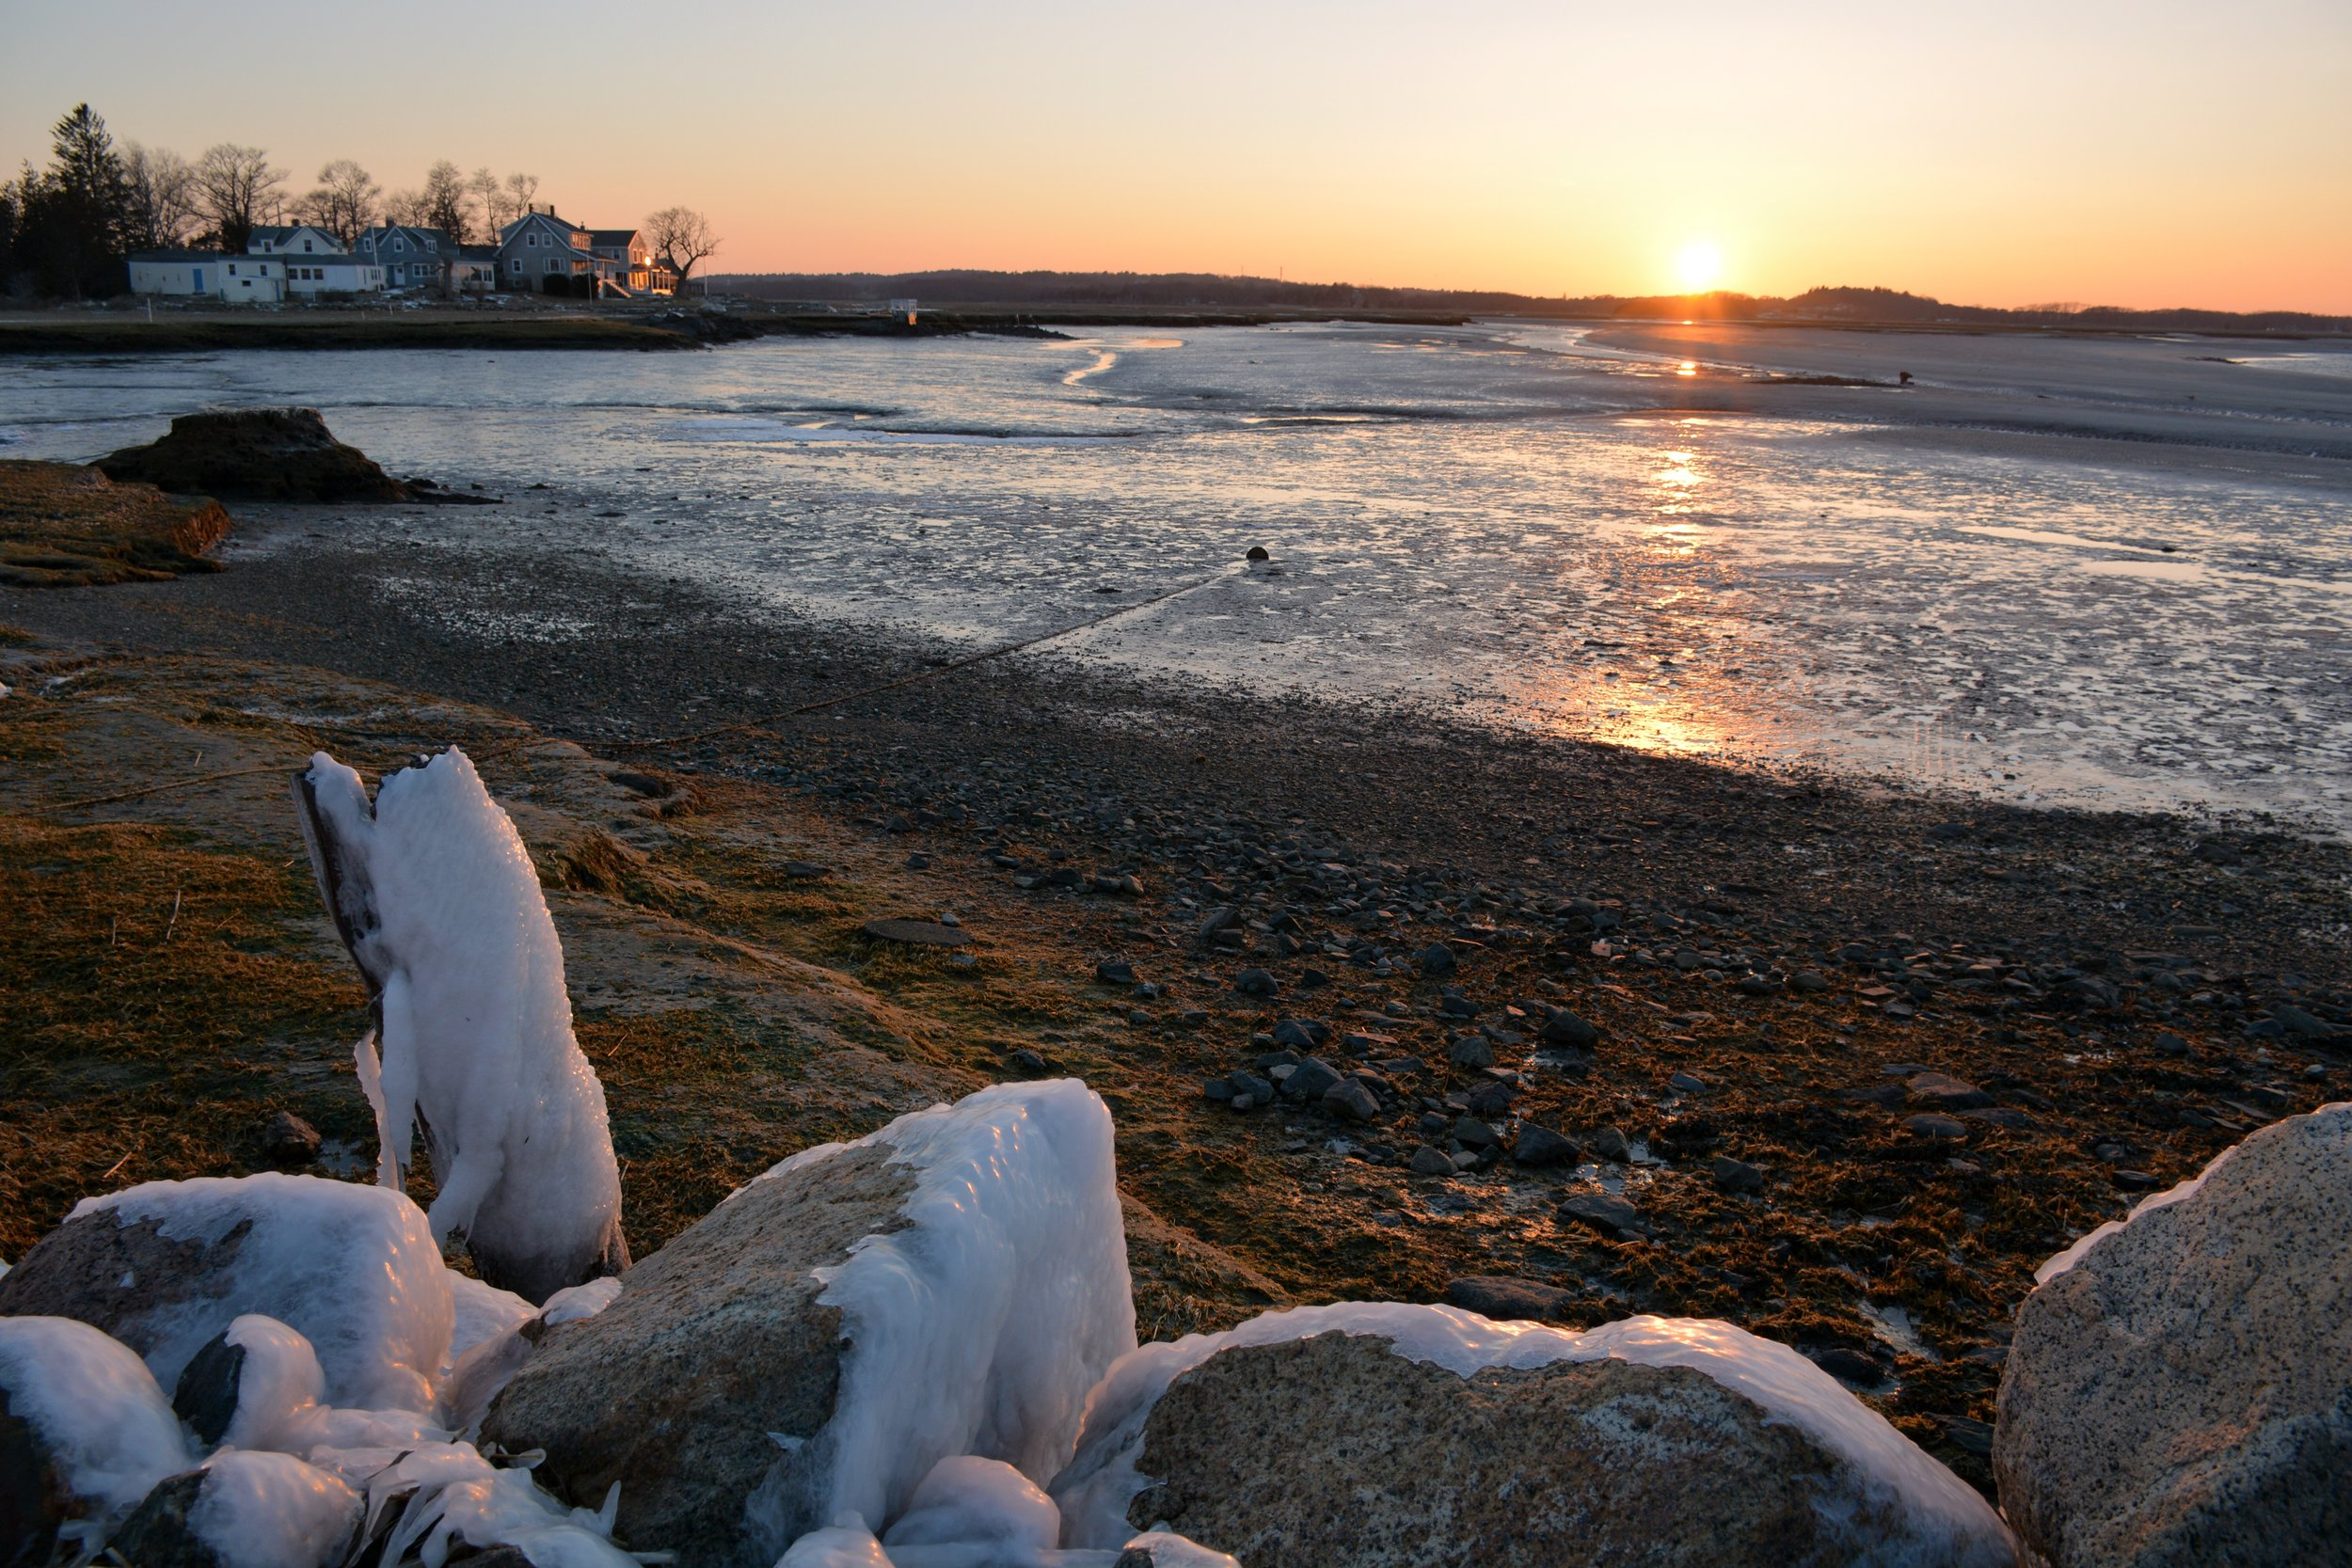 Ice deposits on seaside rocks, overlooking Robbins Island.